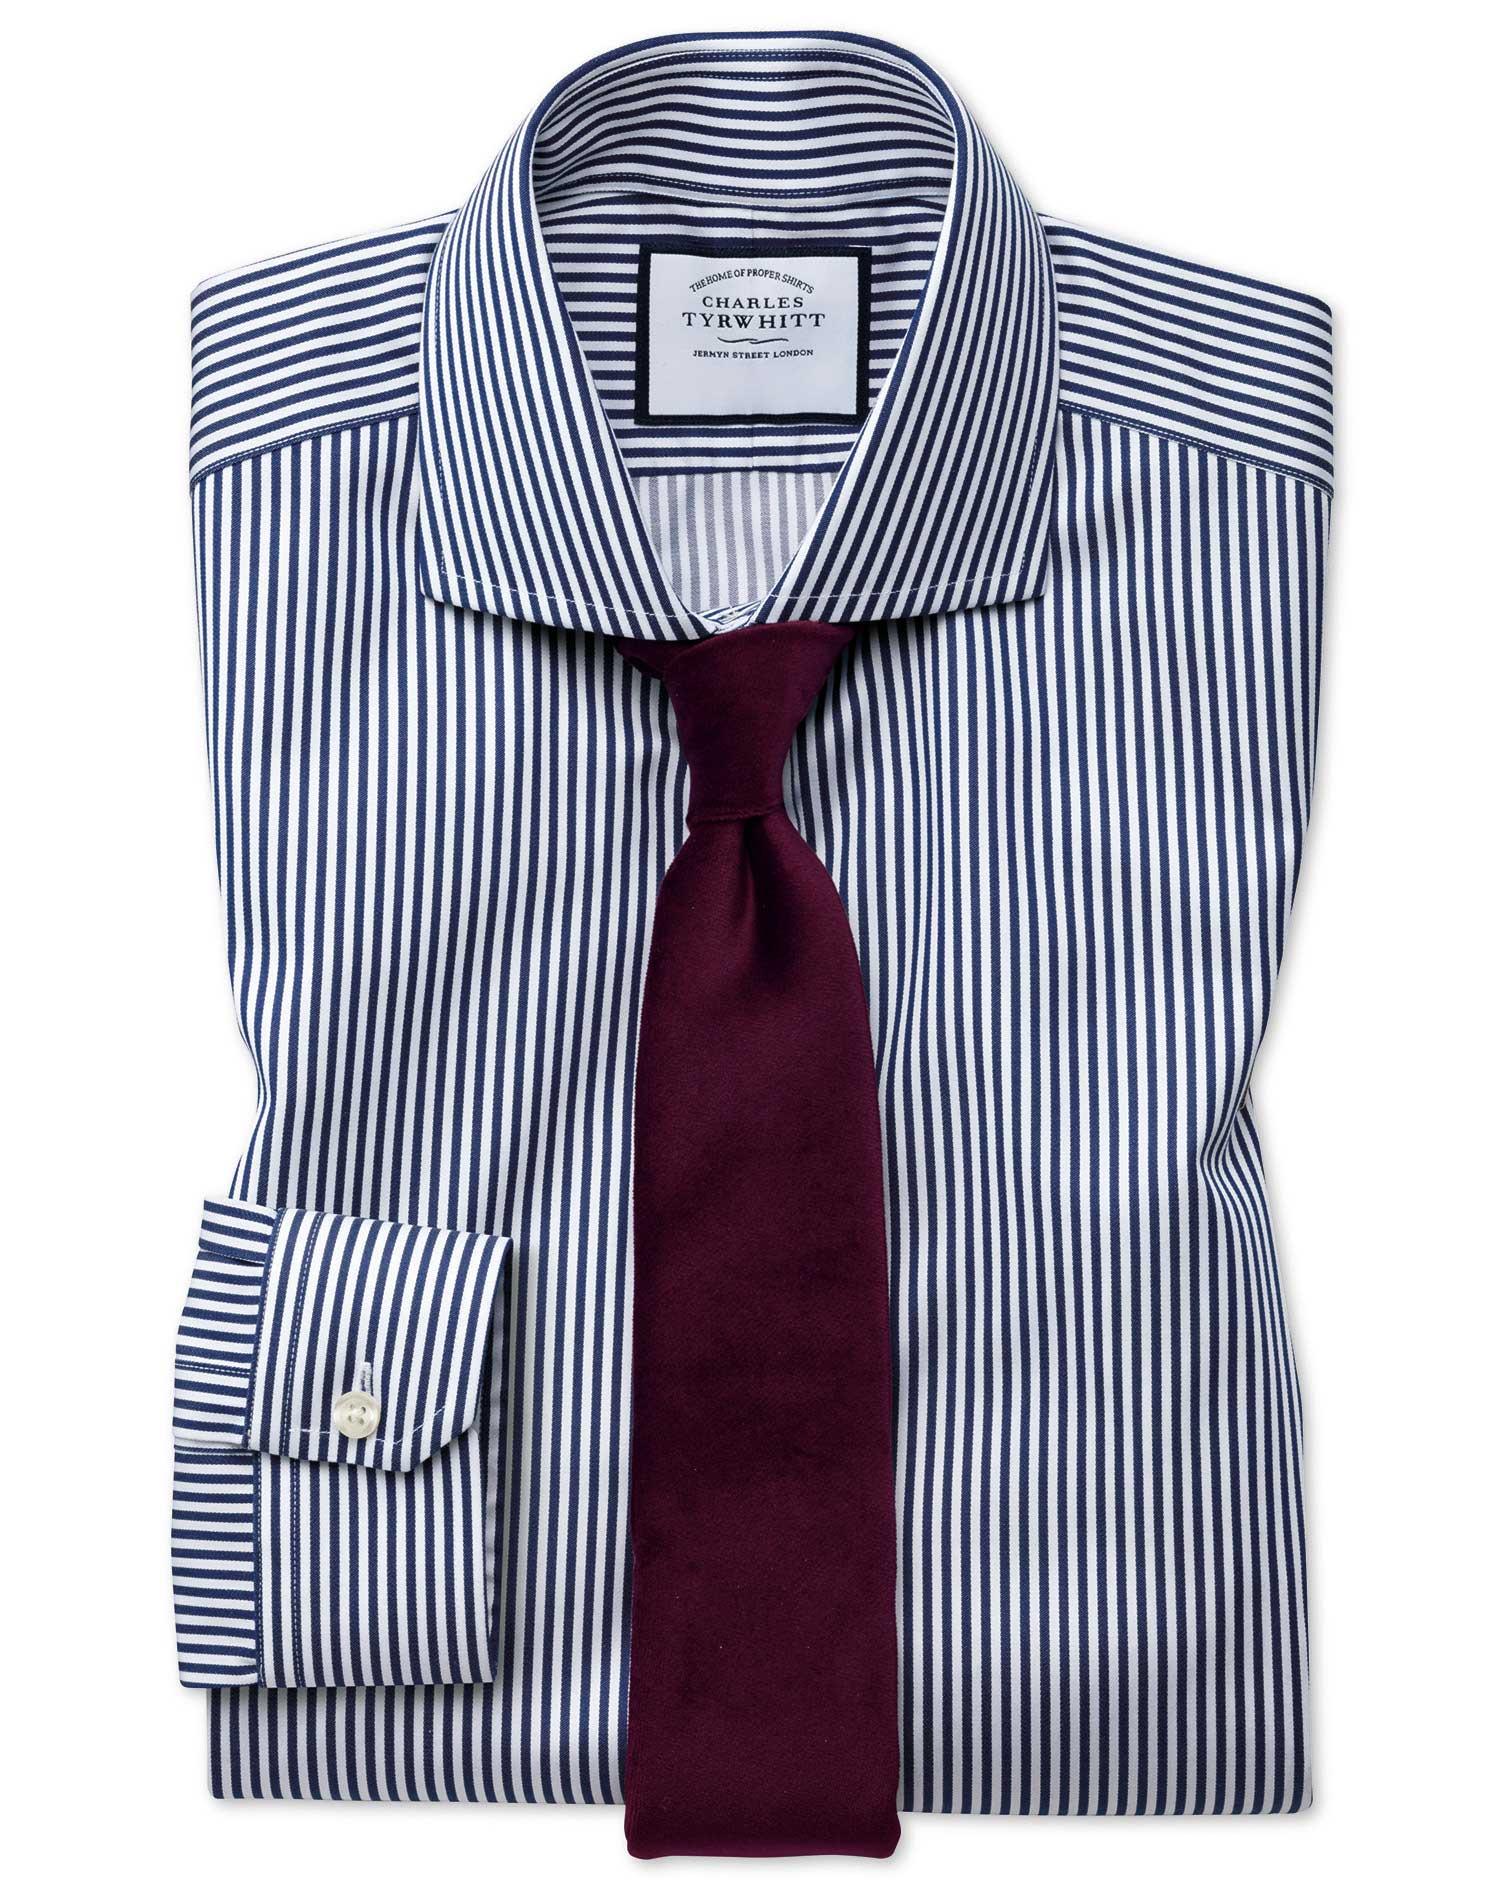 Super Slim Fit Non-Iron Cutaway Collar Navy Twill Stripe Cotton Formal Shirt Single Cuff Size 15.5/3